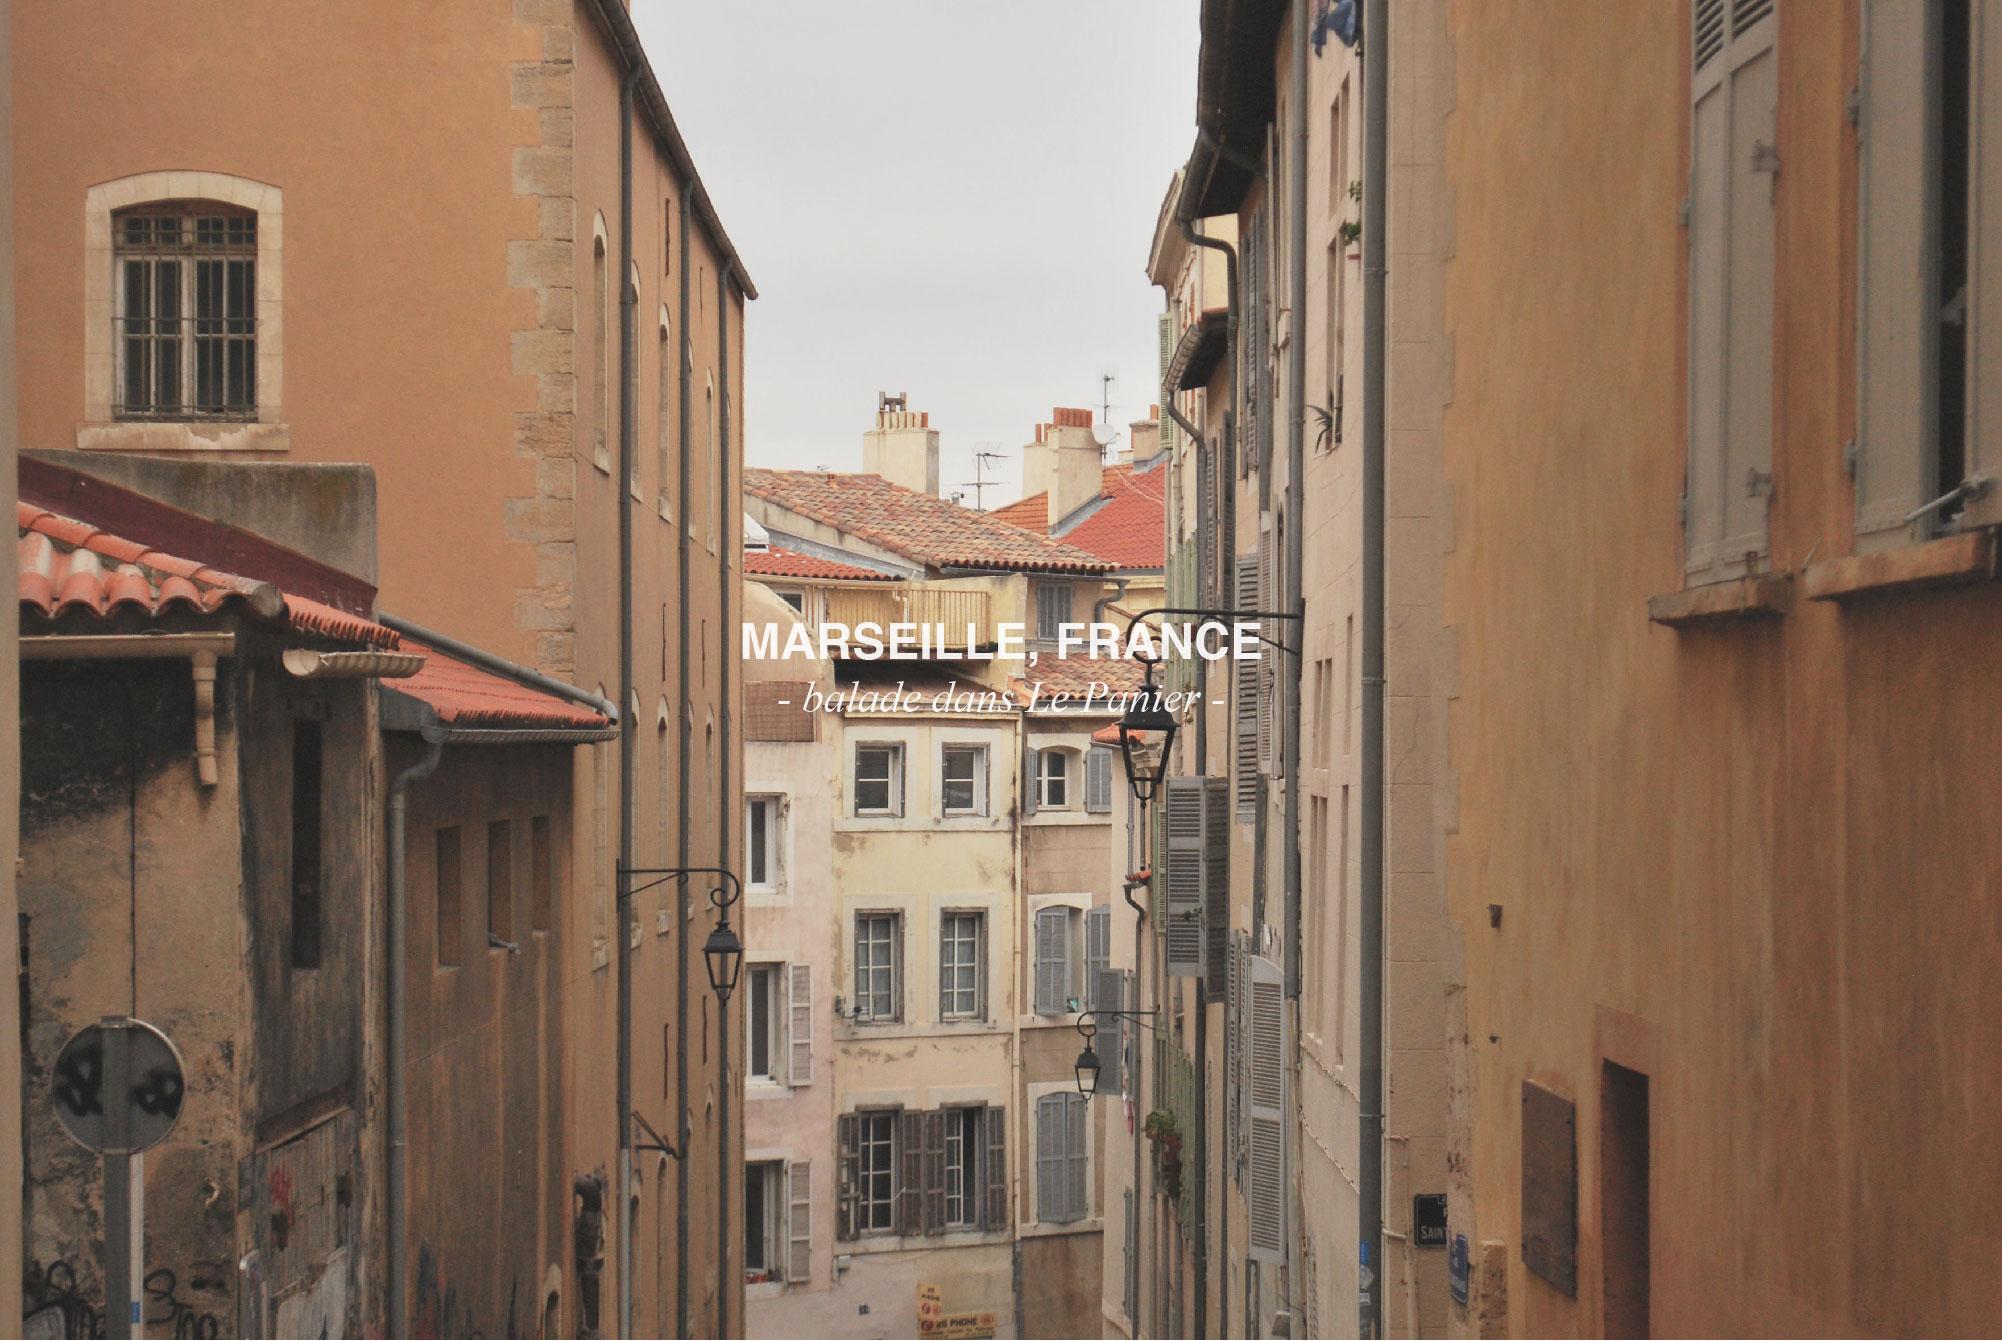 marseille_promenade_panier